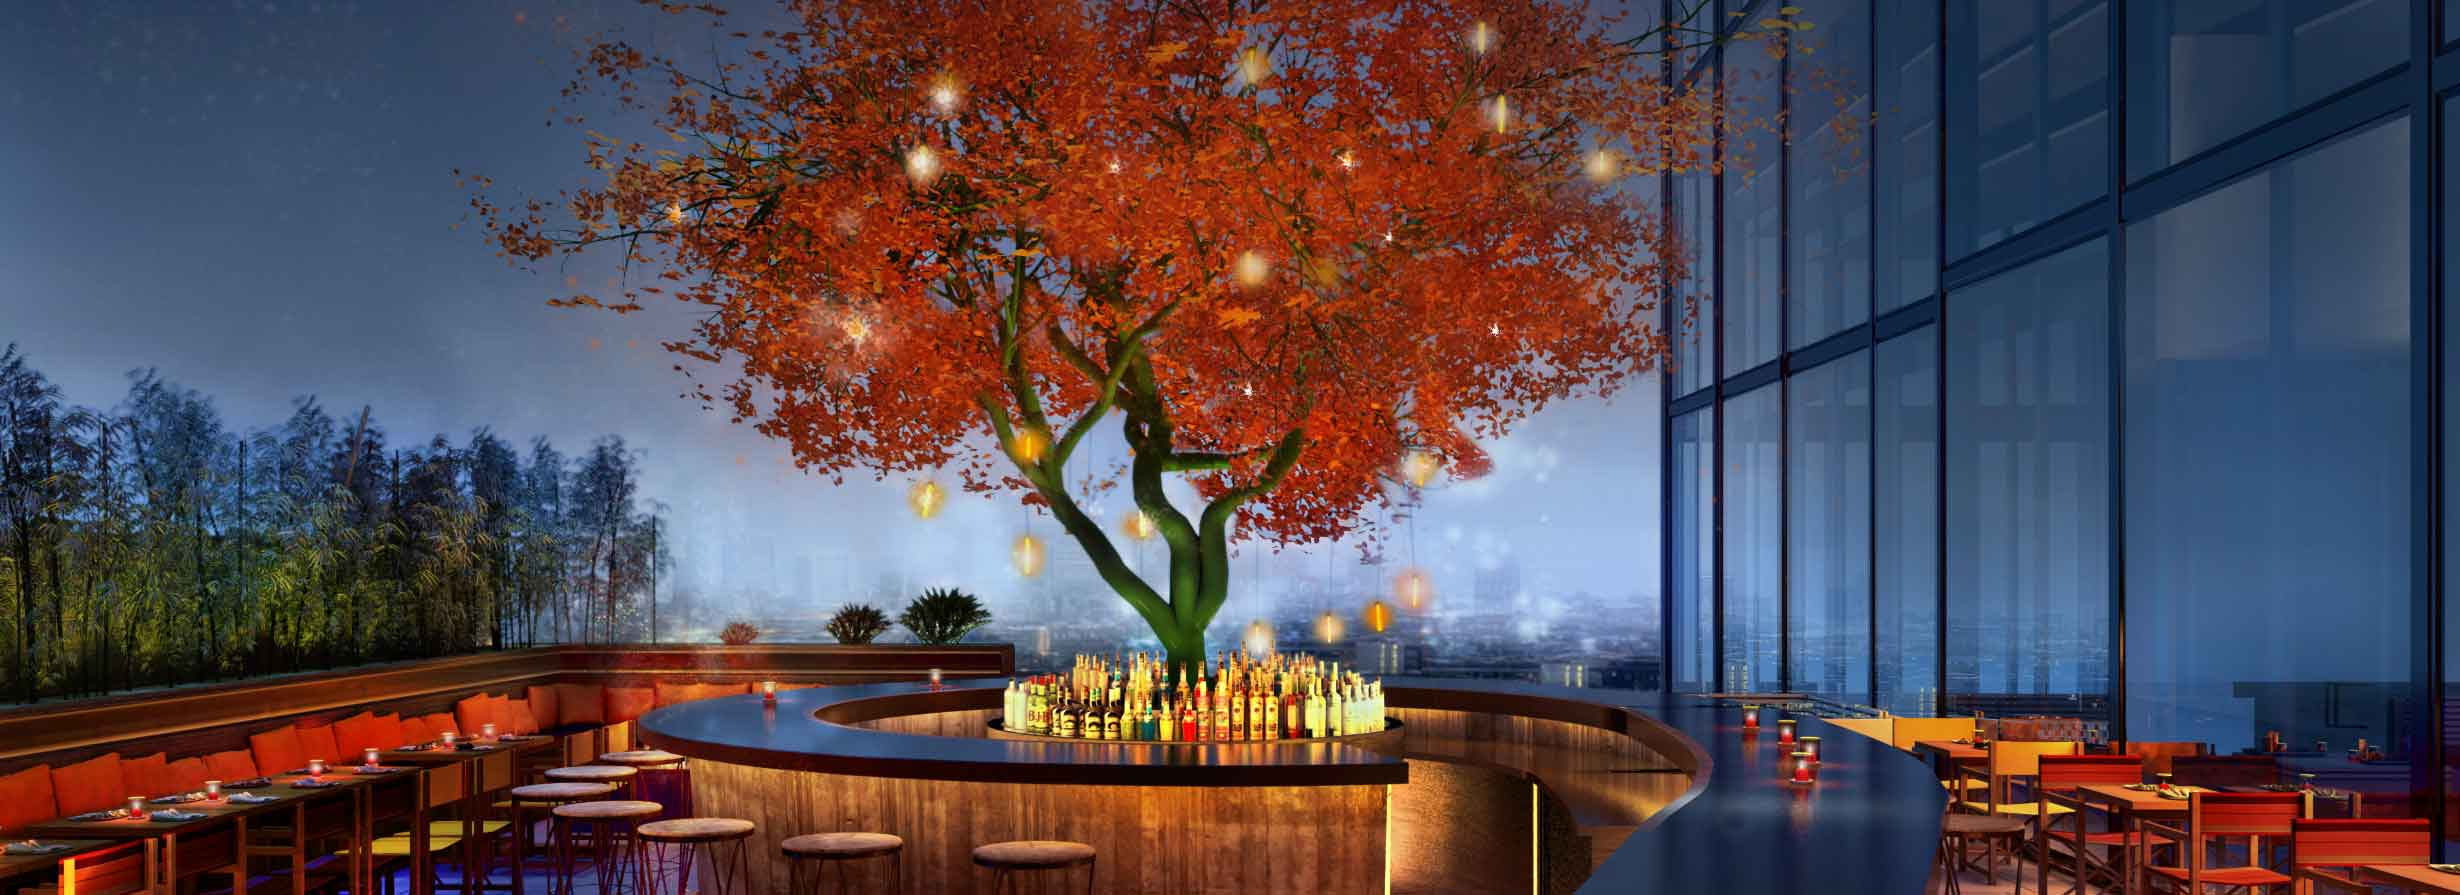 Terrace-bar-at-SushiSamba